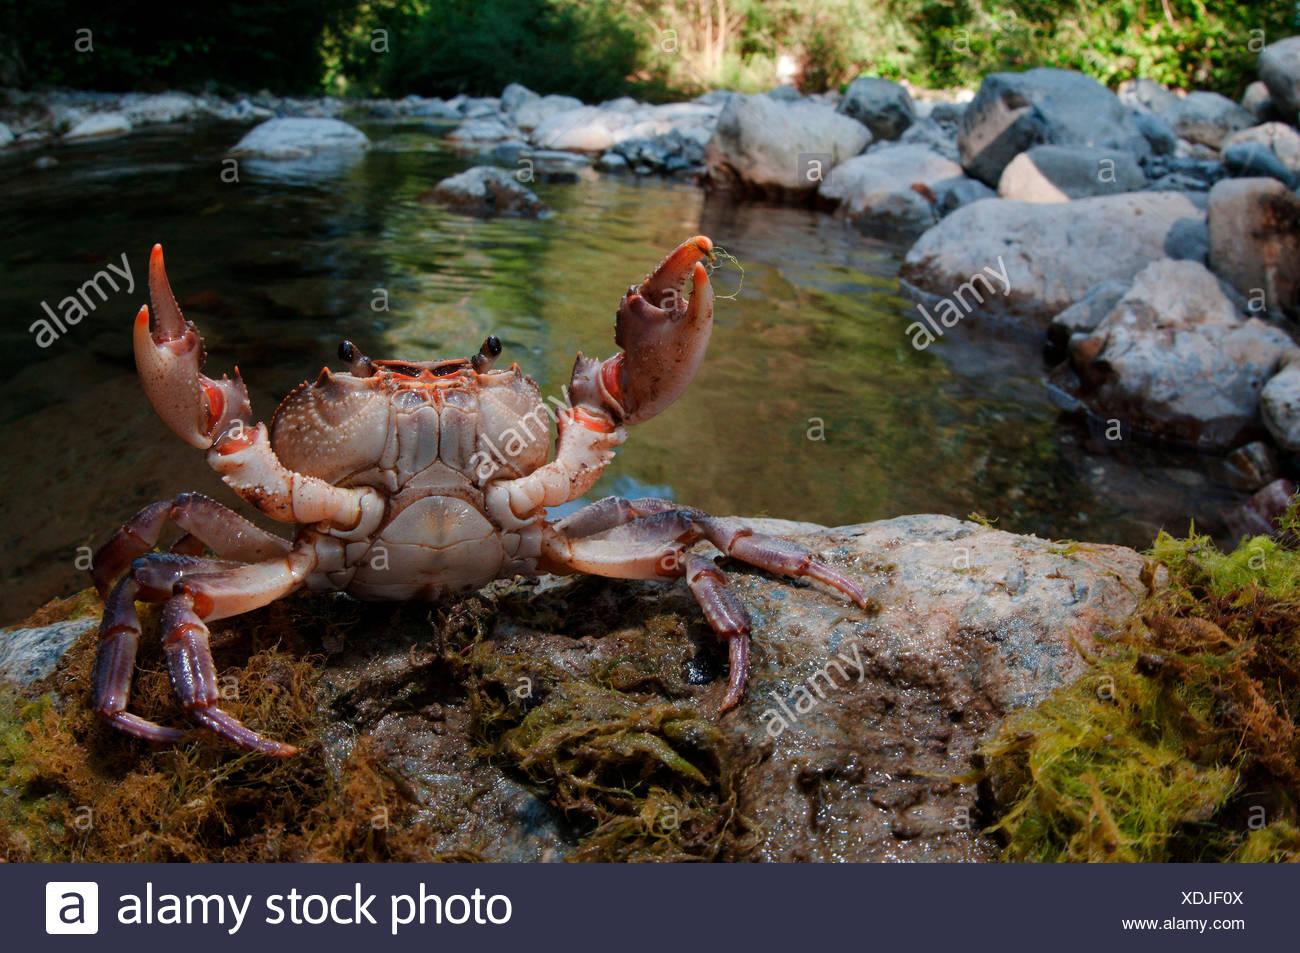 Potamon fluviatile is a rare freshwater italian crab, Vara valley, Genoa, Italy, Europe - Stock Image